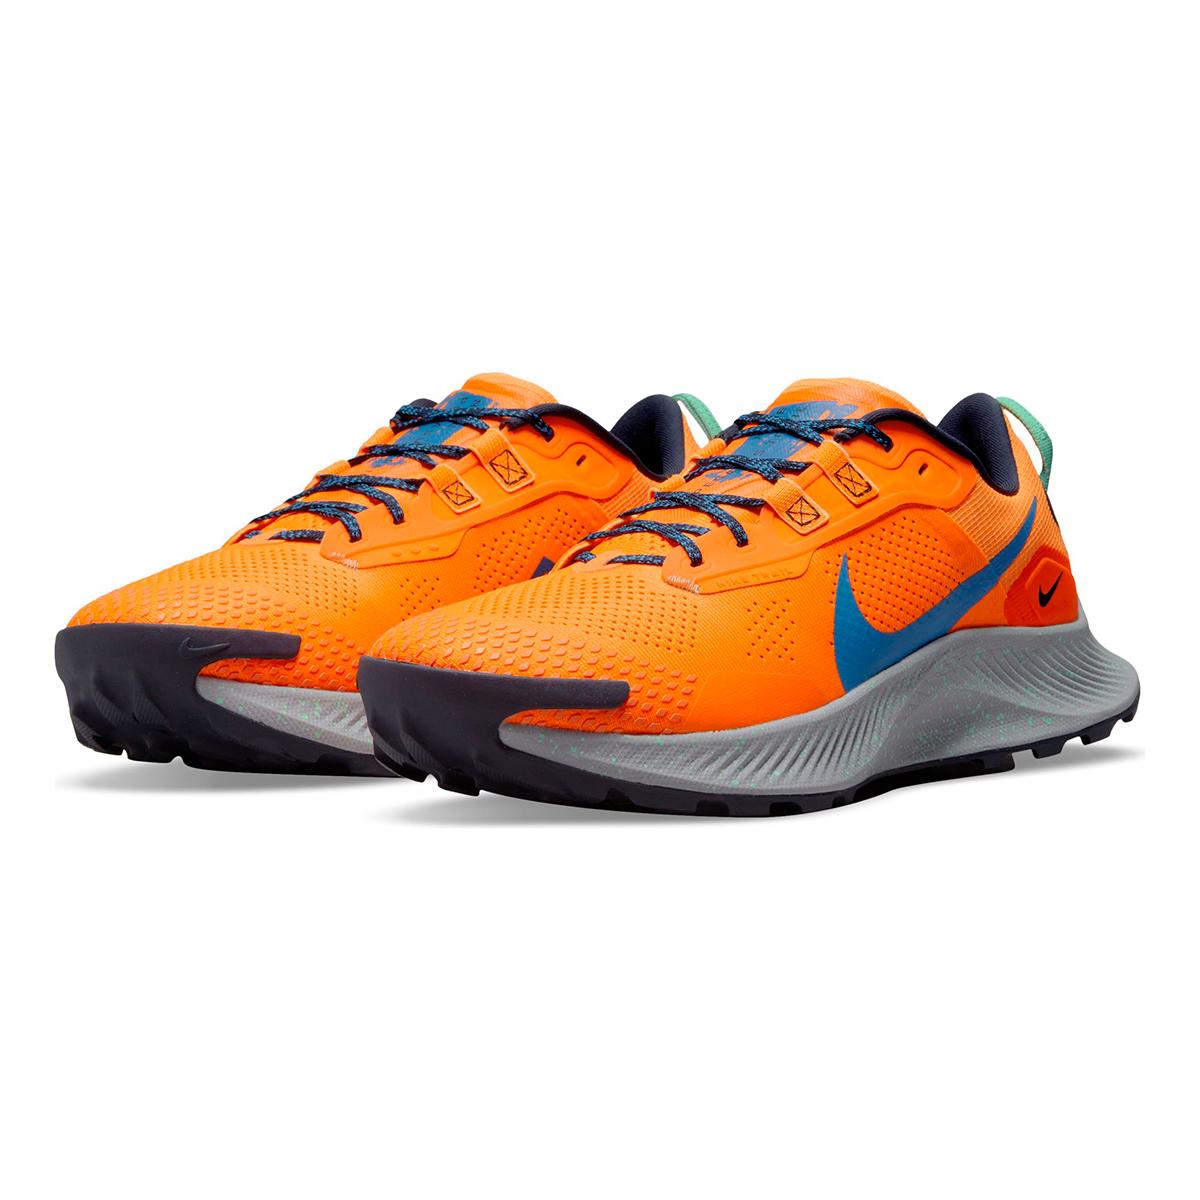 Men's Nike Pegasus Trail 3 Trail Running Shoe - Color: Total Orange/Signal Blue/Wolf Grey - Size: 6 - Width: Regular, Total Orange/Signal Blue/Wolf Grey, large, image 3